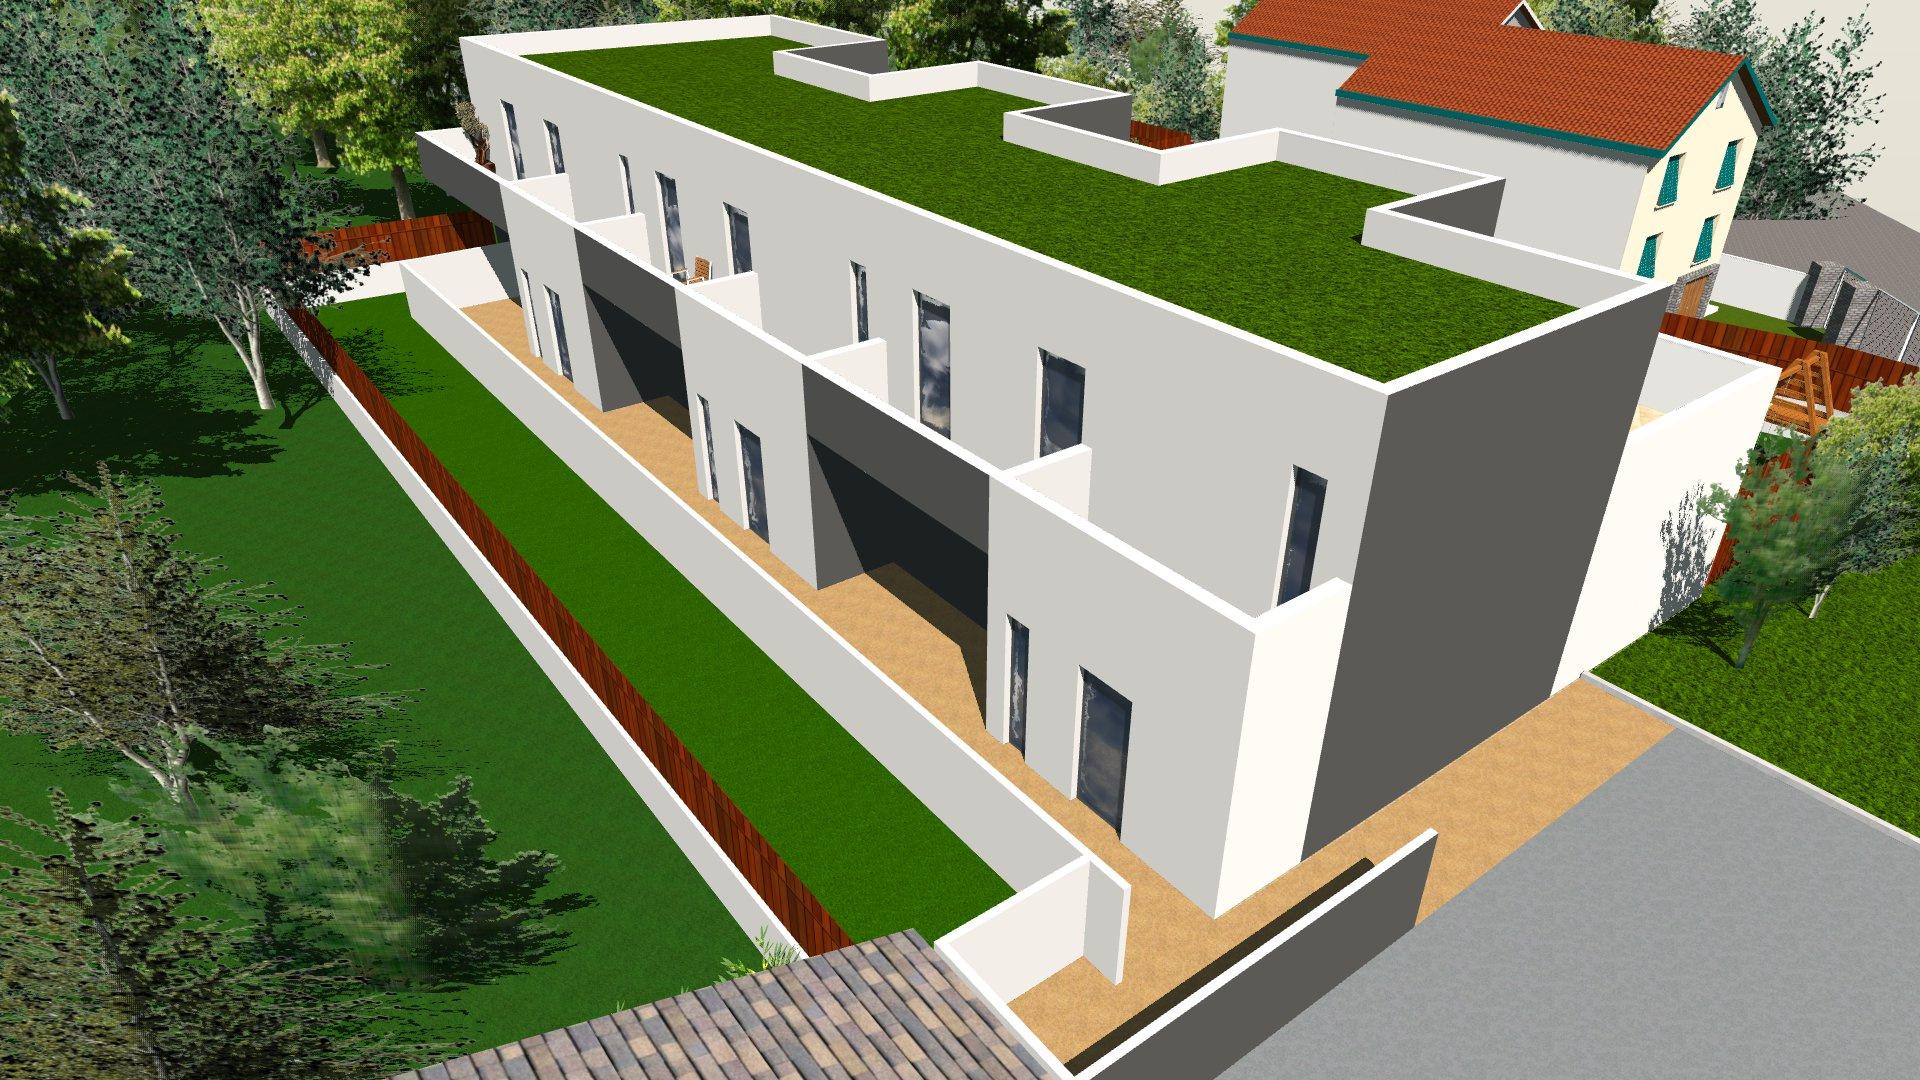 Vente maison/villa quetigny bus / tram